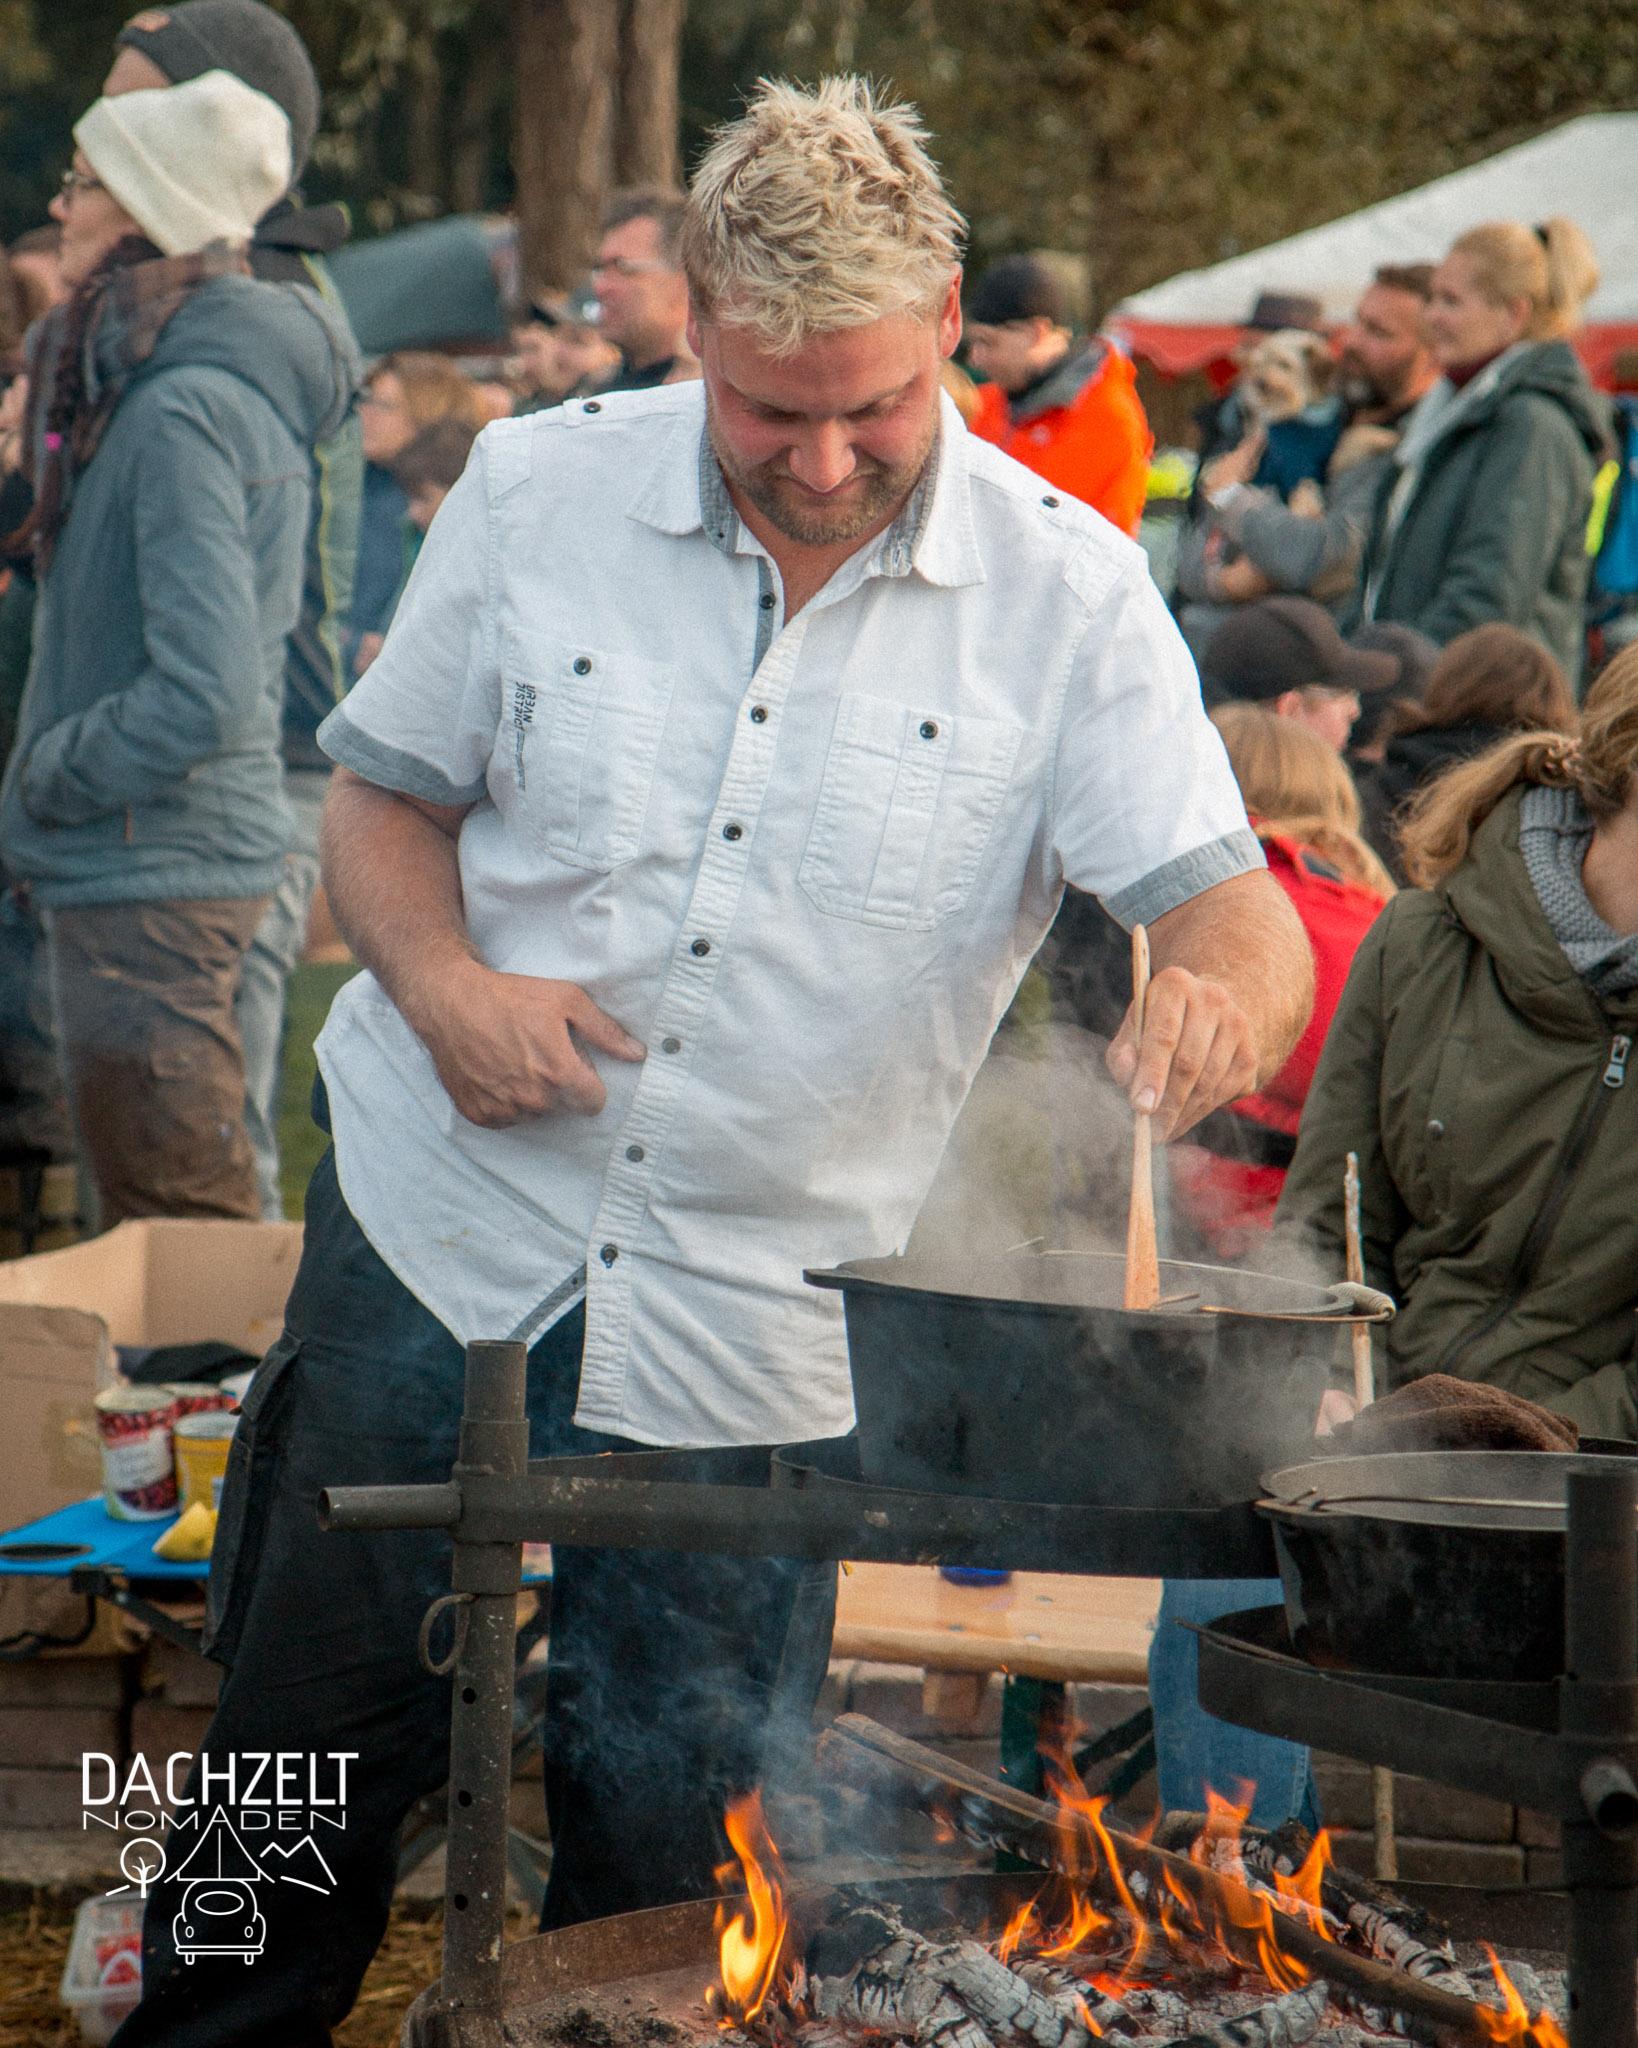 20191019-Dachzelt-Camp-Speciaal-Hias-Remesch-IMG 8019